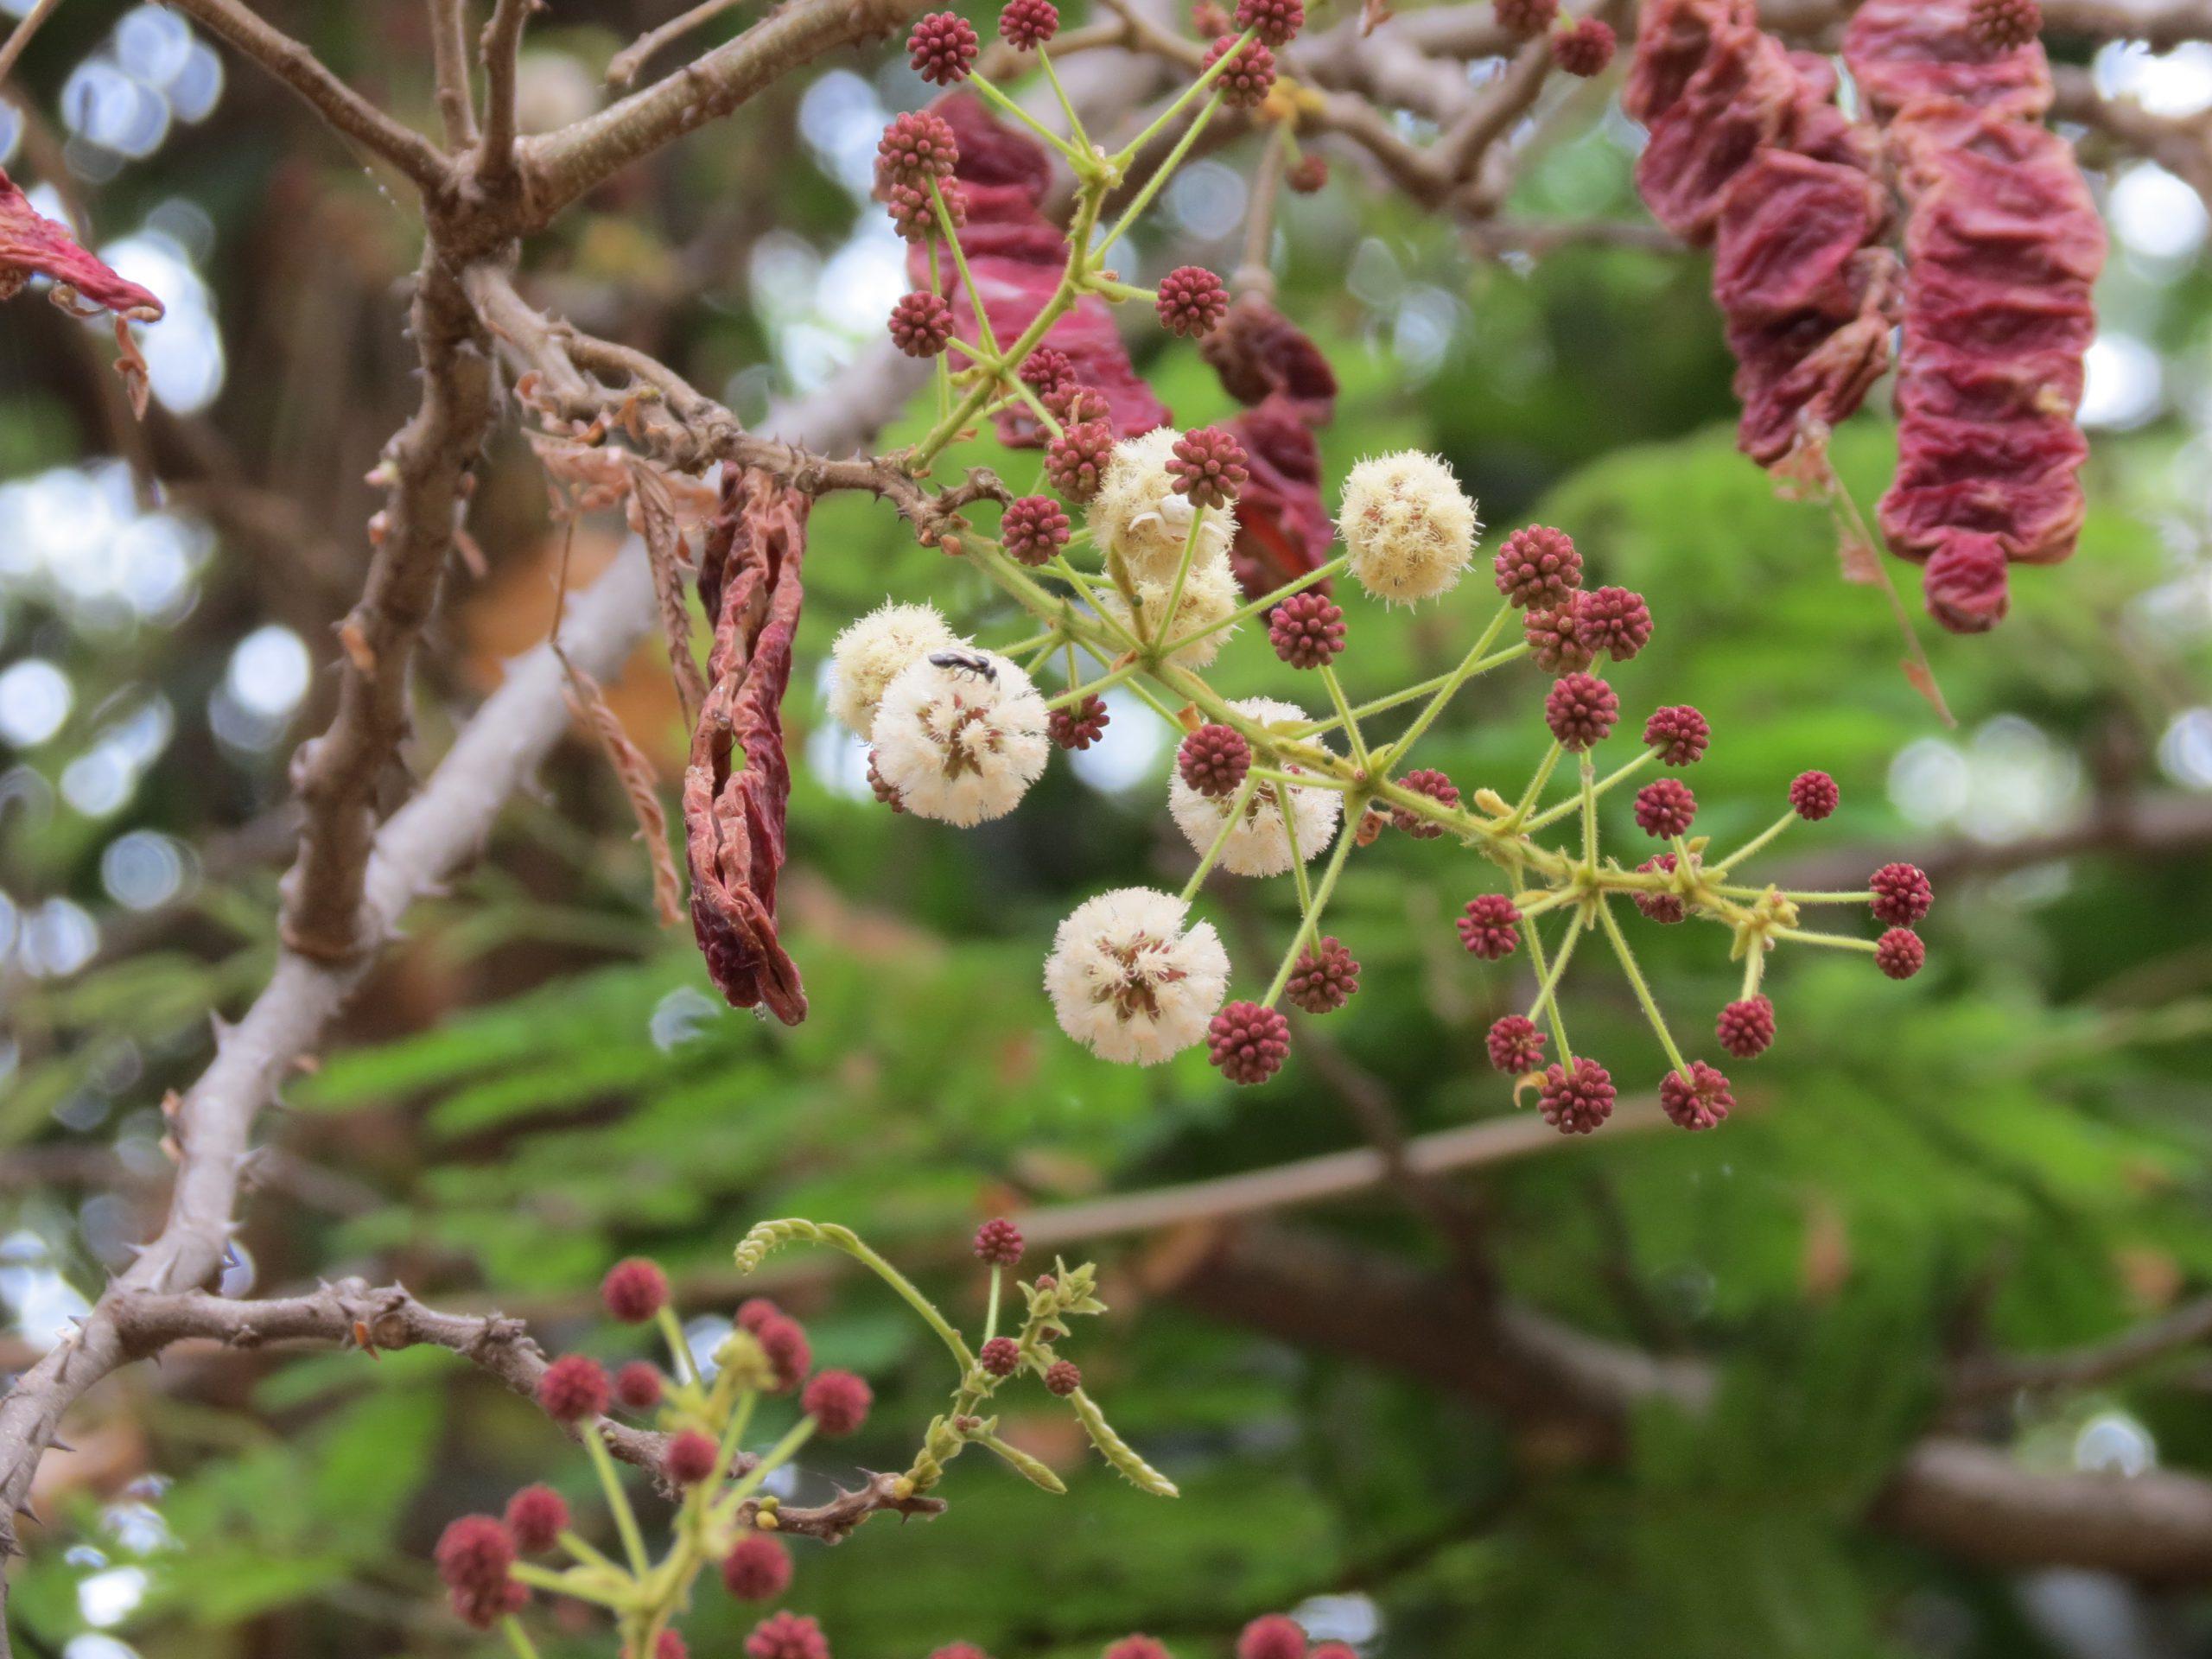 Acacia Sinuata Charmalentha Charmanthala Cheeka Cheekkakka Cheenikka Cheevikka Perumkai Shivakai Ritha Soapnut Acacia Plant Plantslive Buy Plants Online India